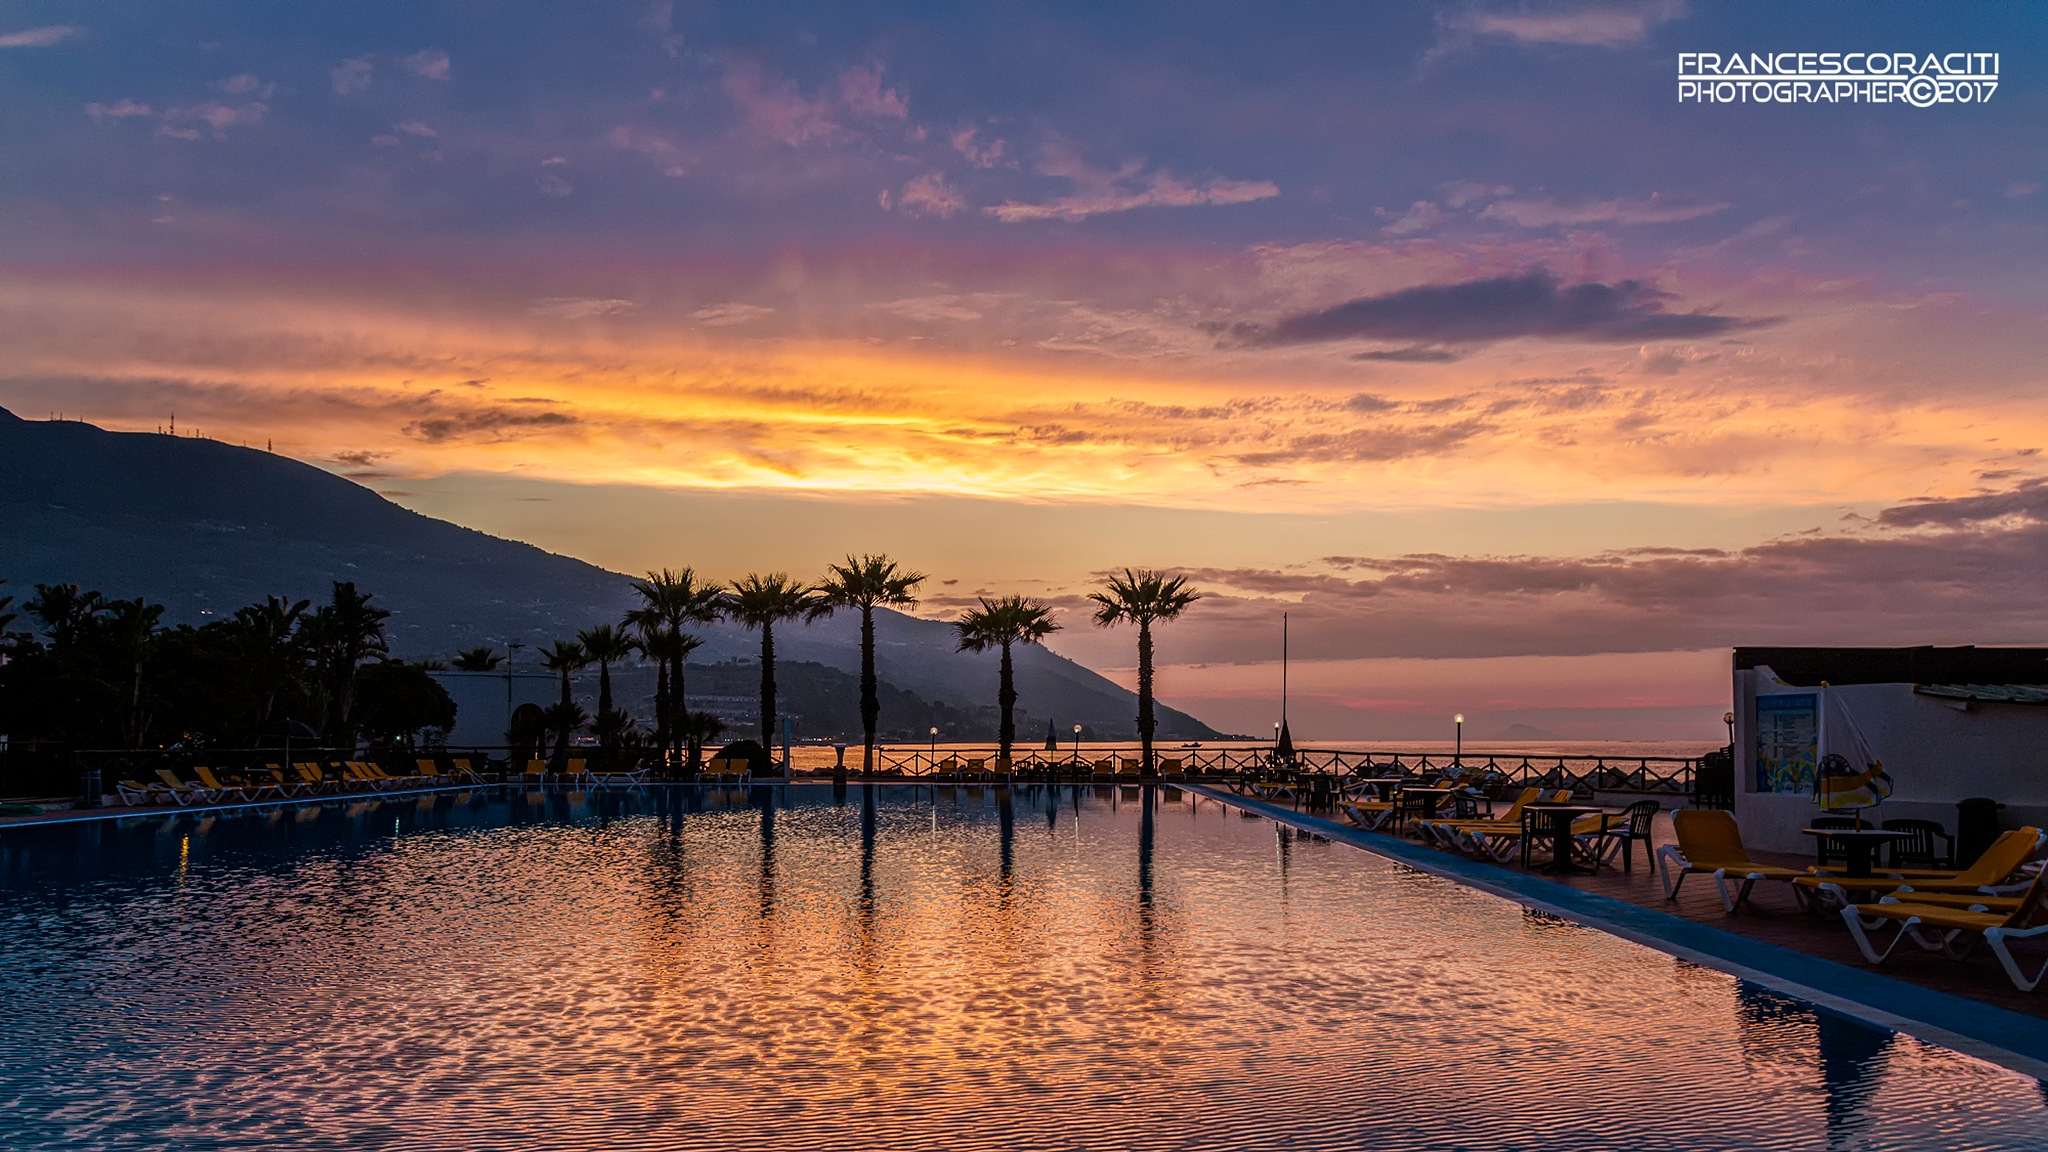 Sunset 2 by Francesco Raciti